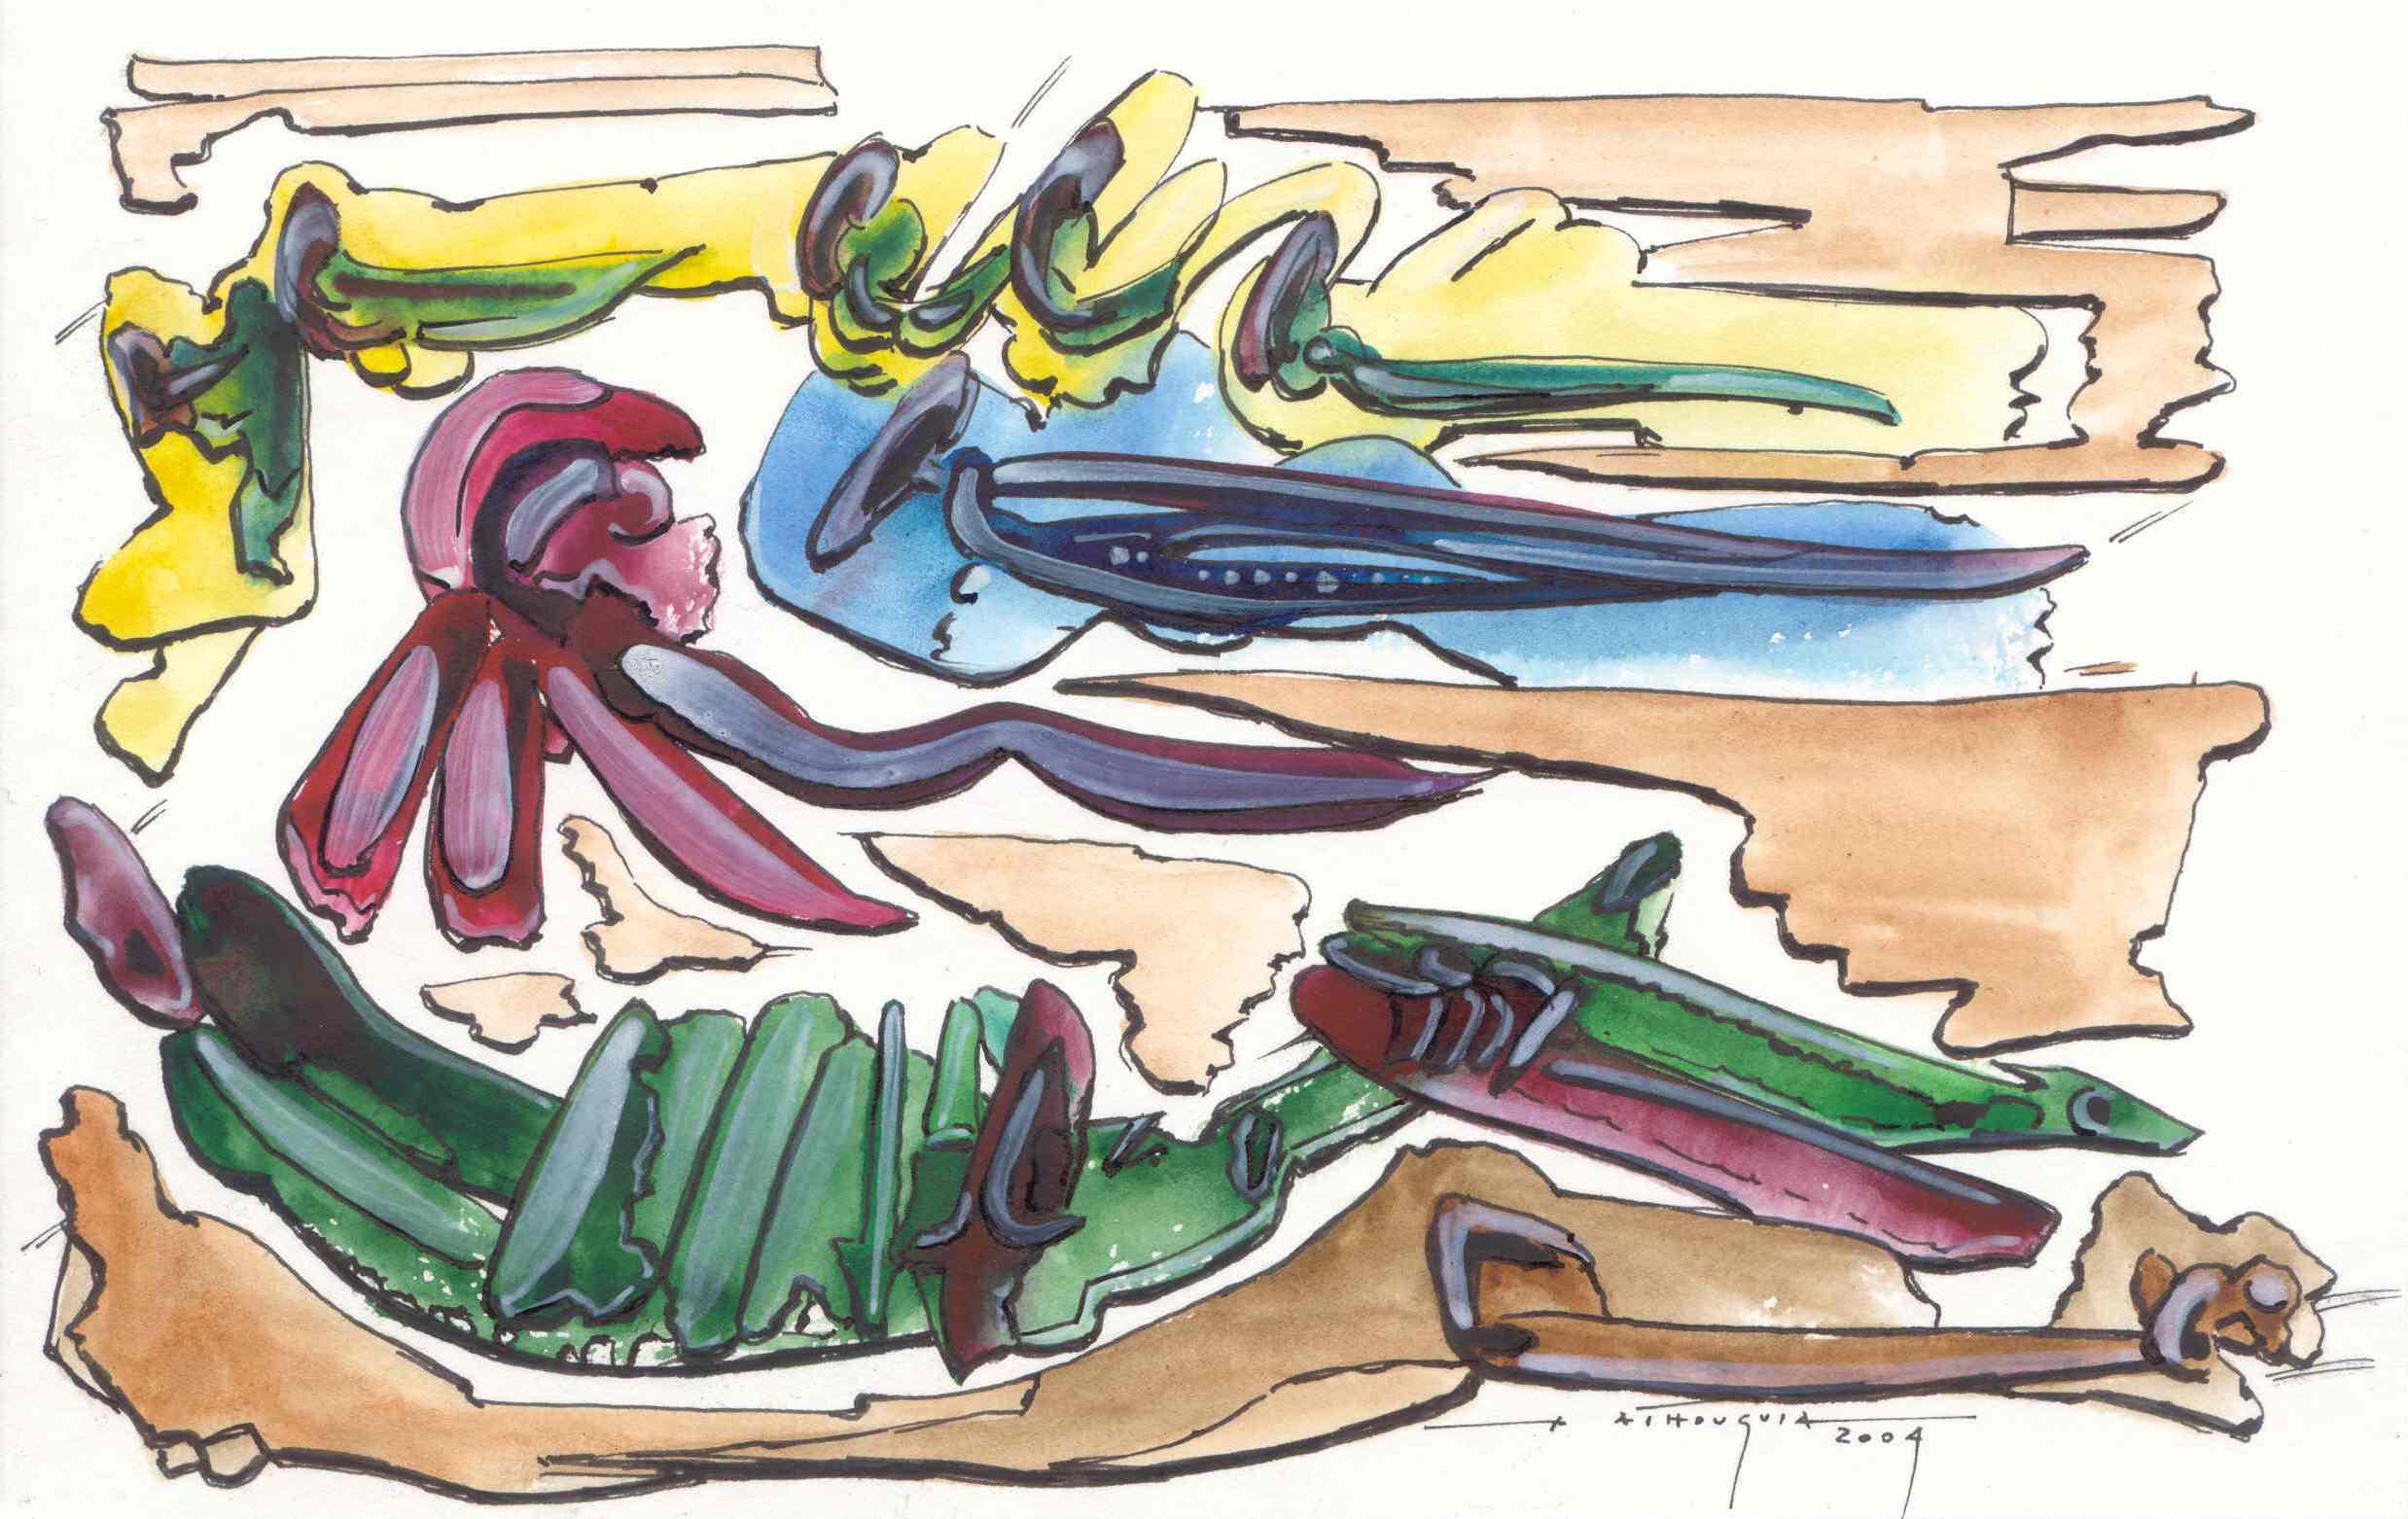 4Imateriali 2004.jpg